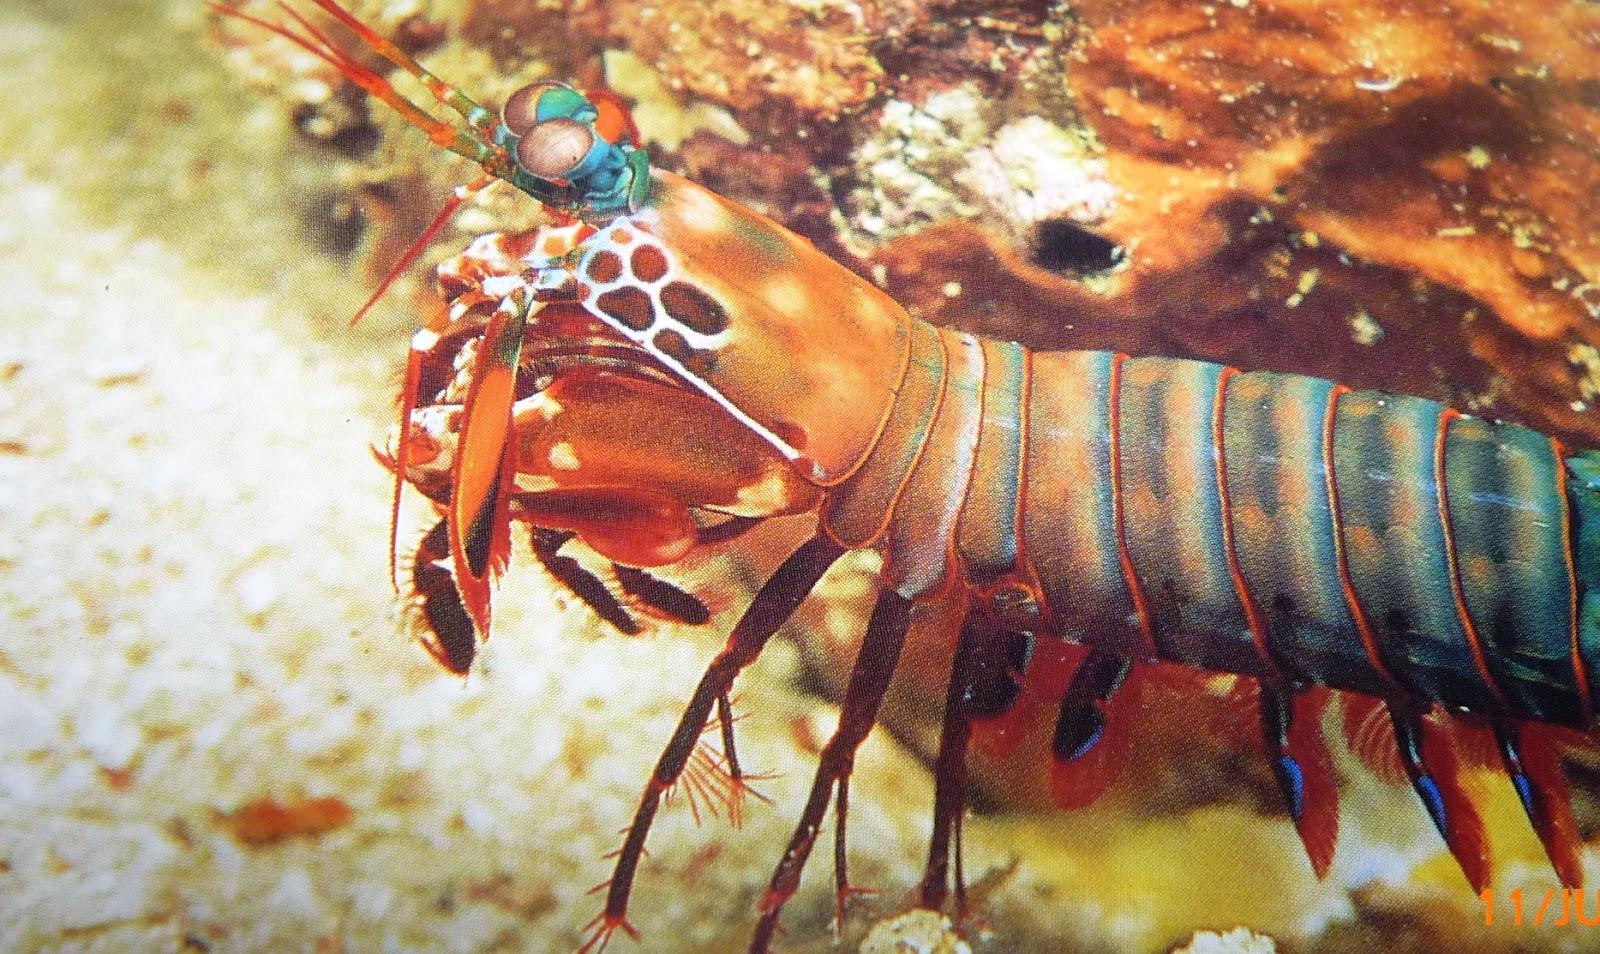 mantis shrimp essay This free environmental studies essay on the mantis shrimp is perfect for environmental studies students to use as an example.